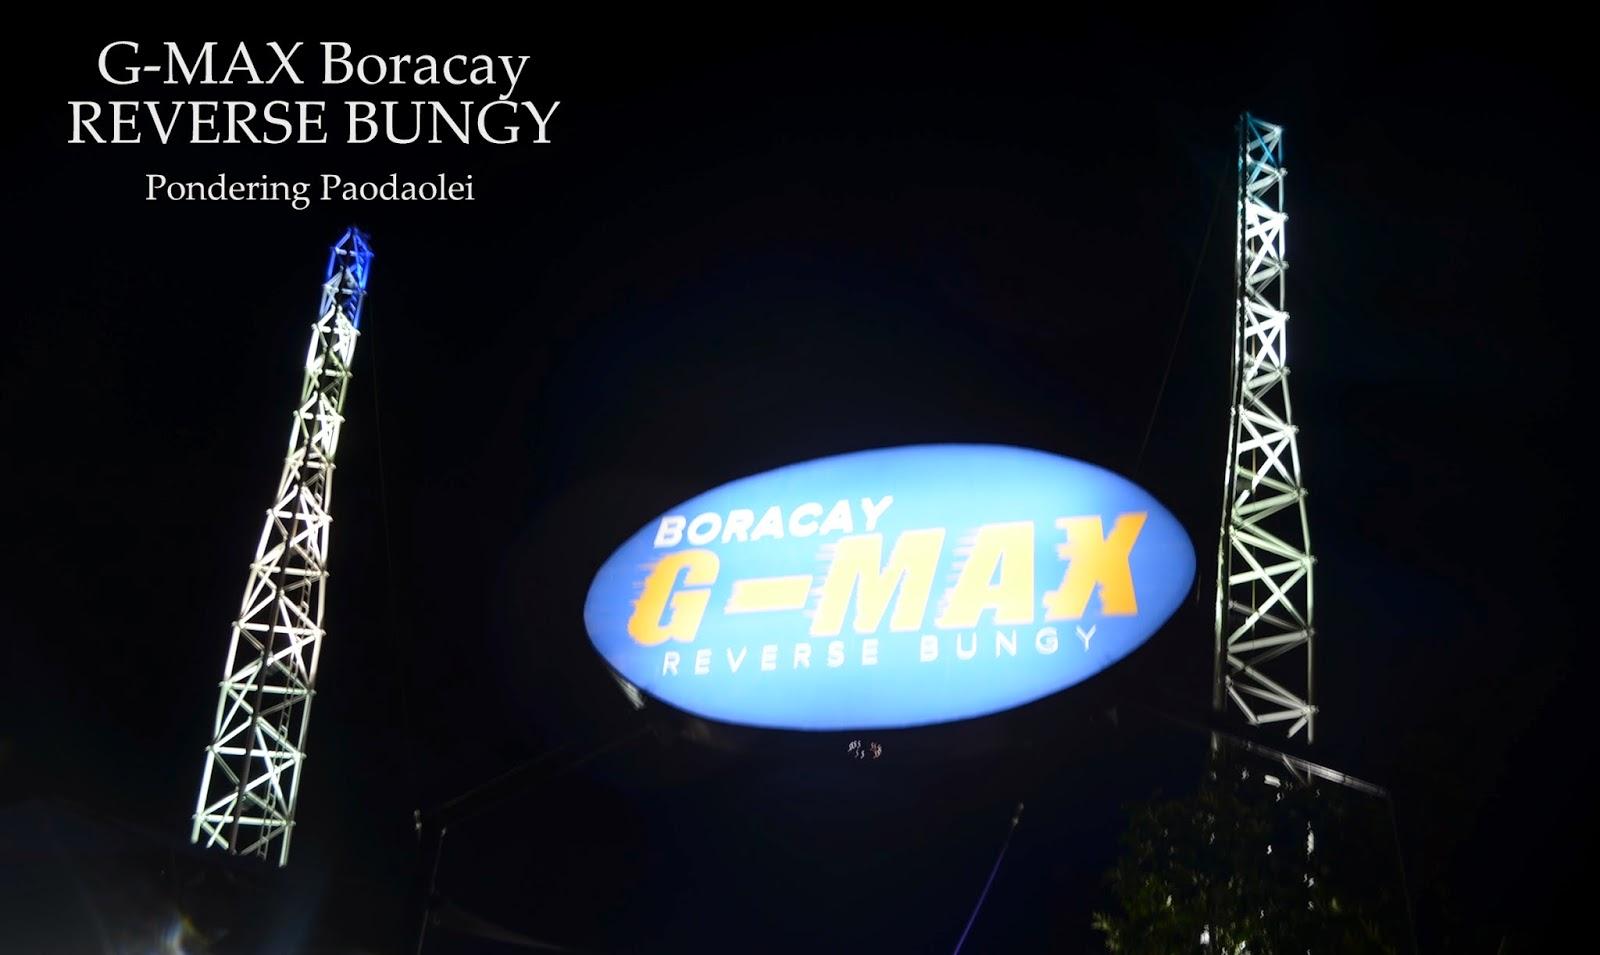 G-Max Boracay:  My Mind Said No But My Heart Said Go